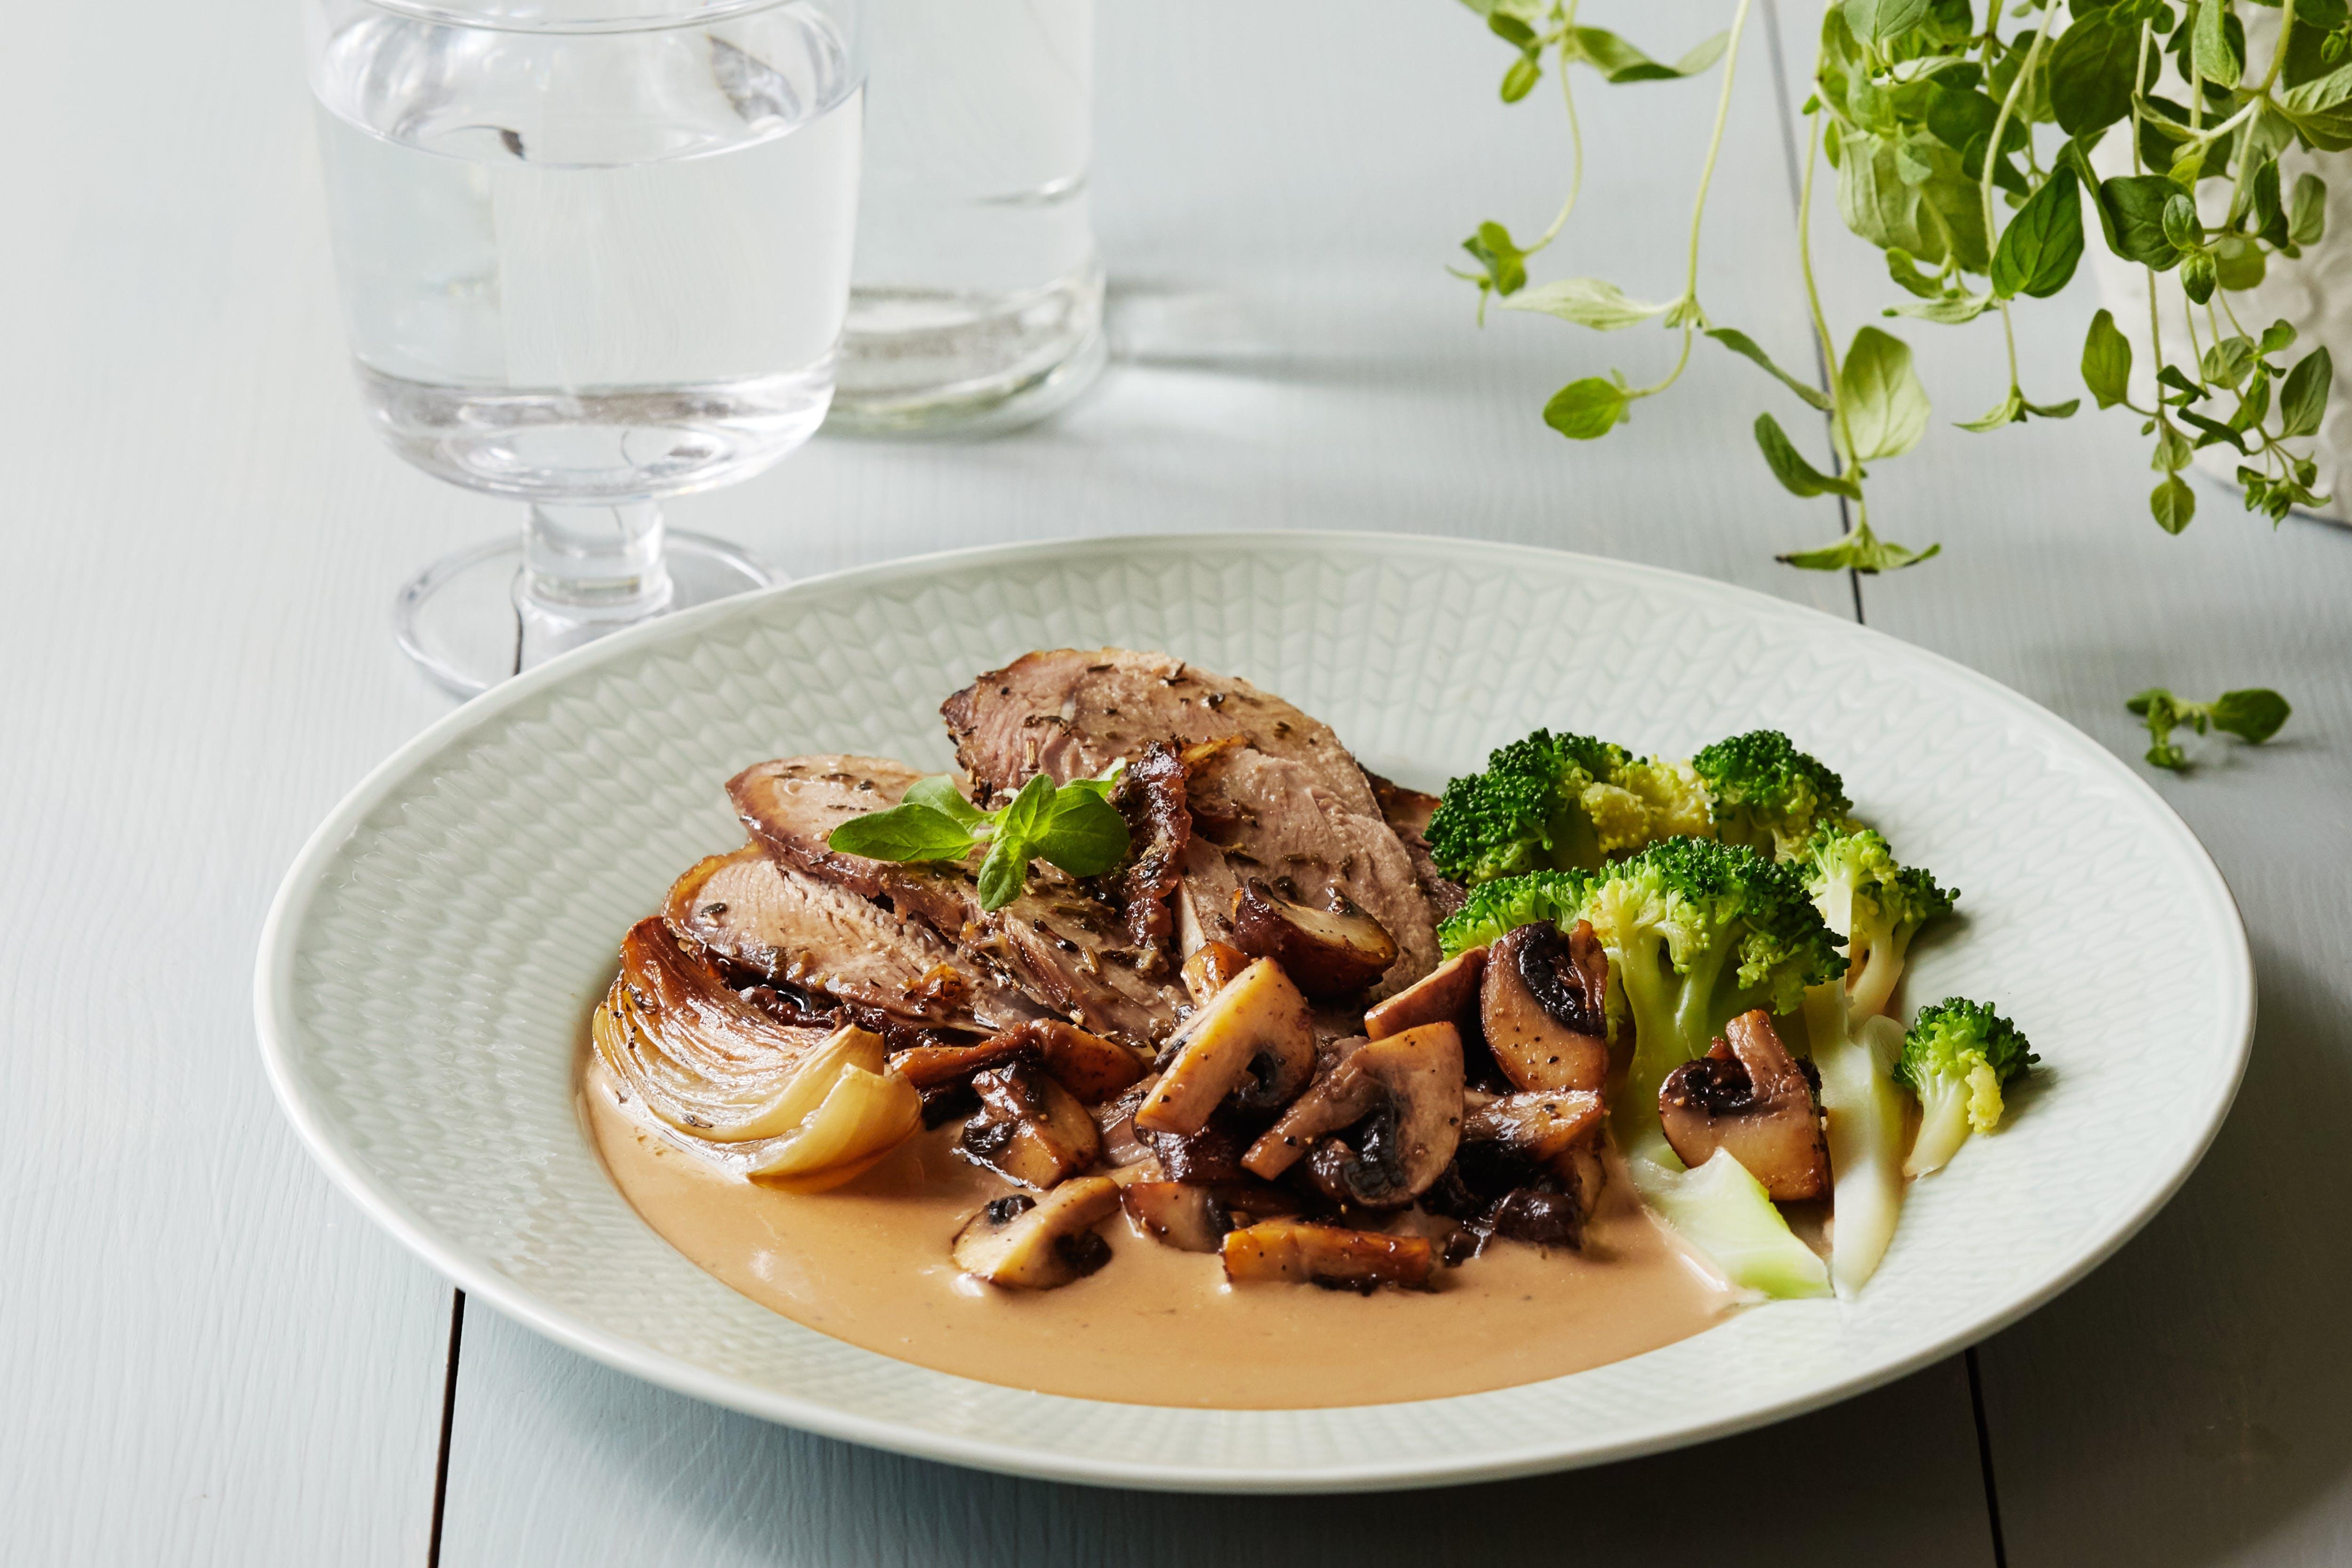 Oven-roasted turkey thighs with mushroom sauce